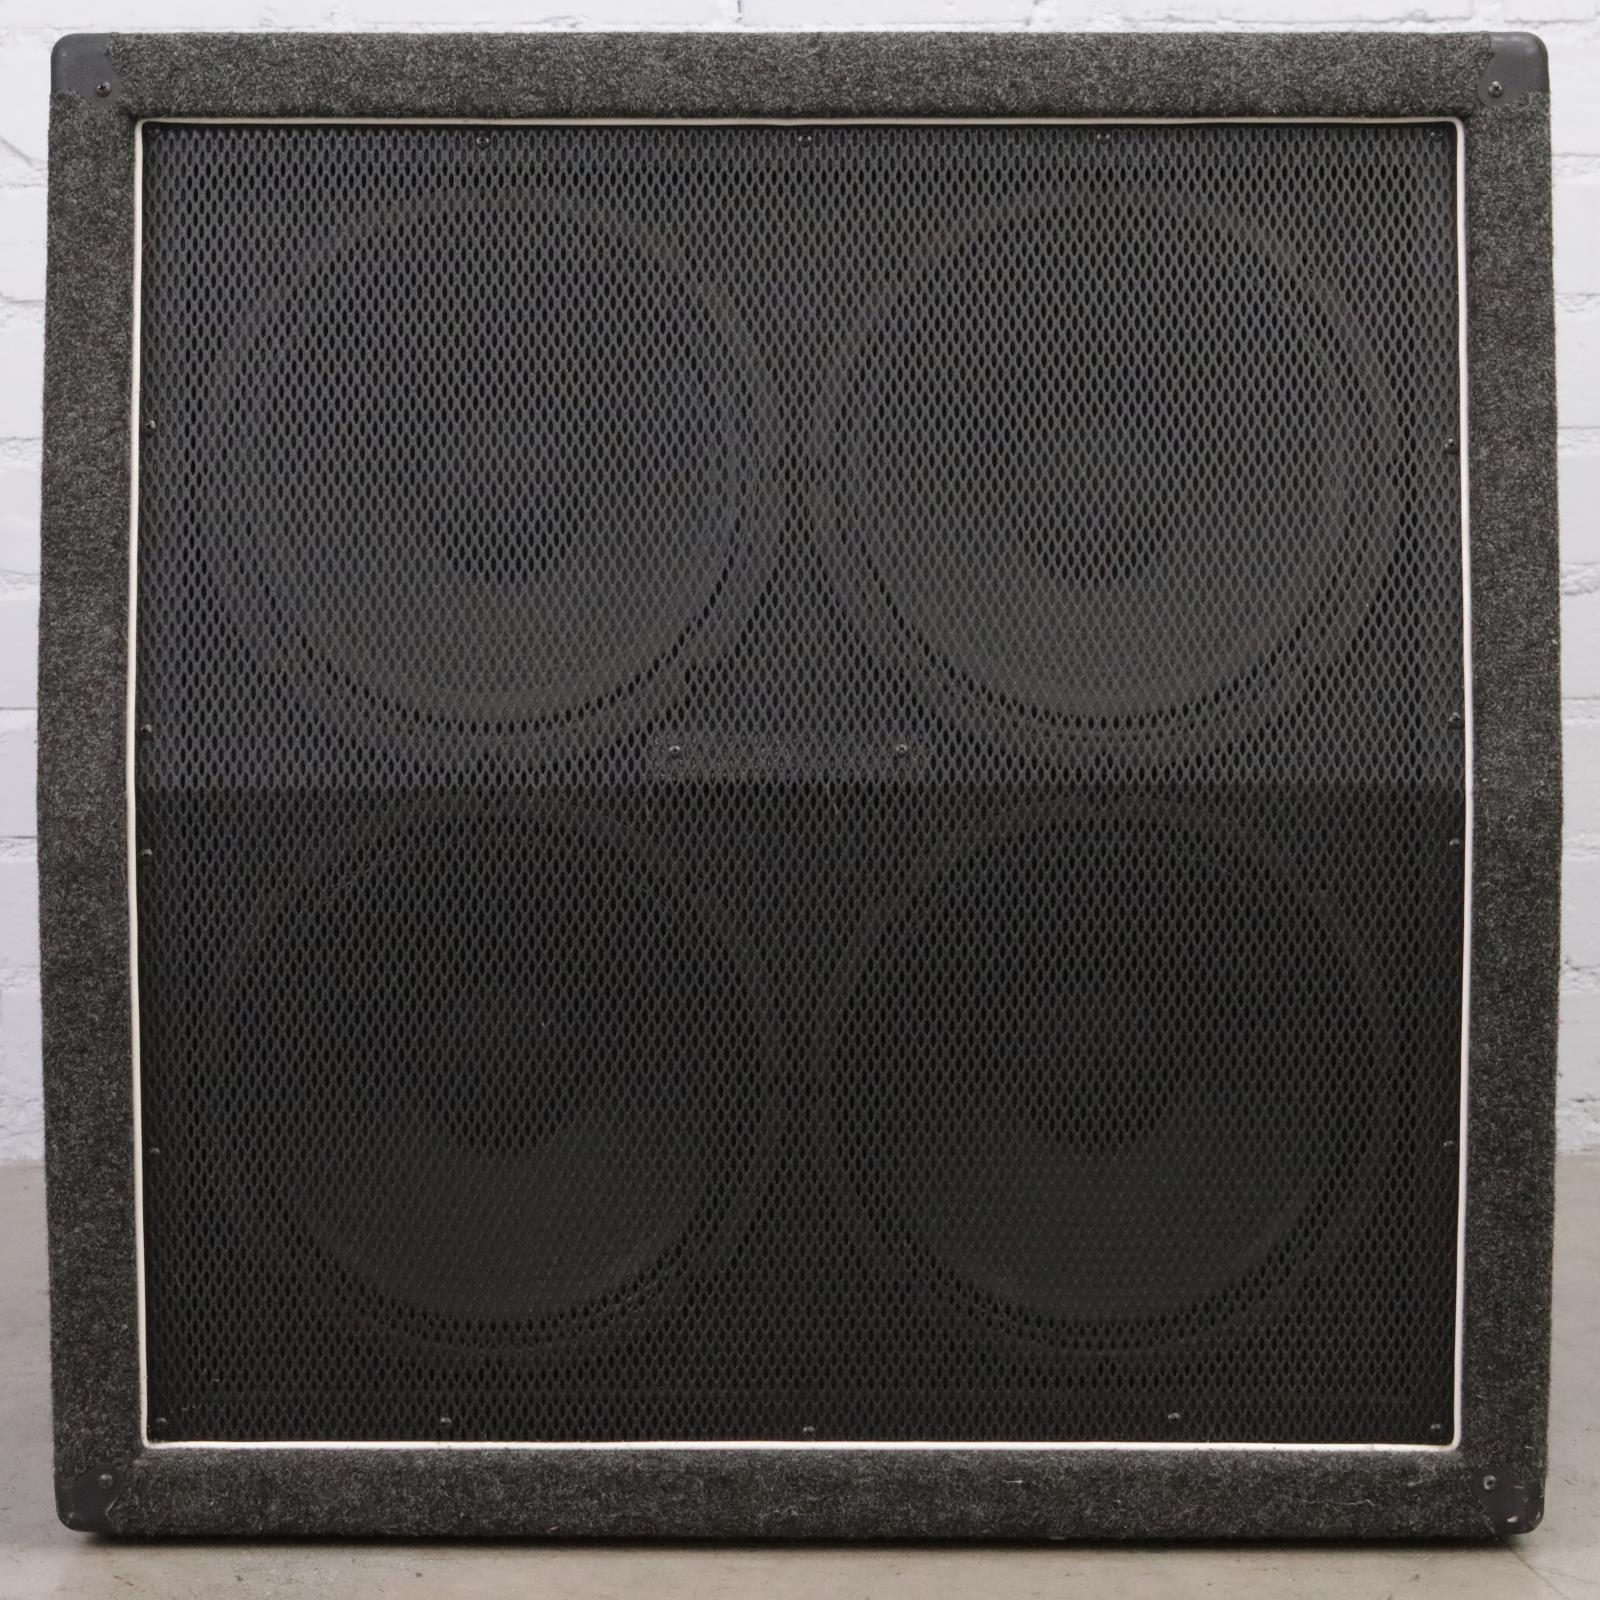 "Carvin Model V412 4x12"" Guitar Amp Speaker Cabinet #44854"